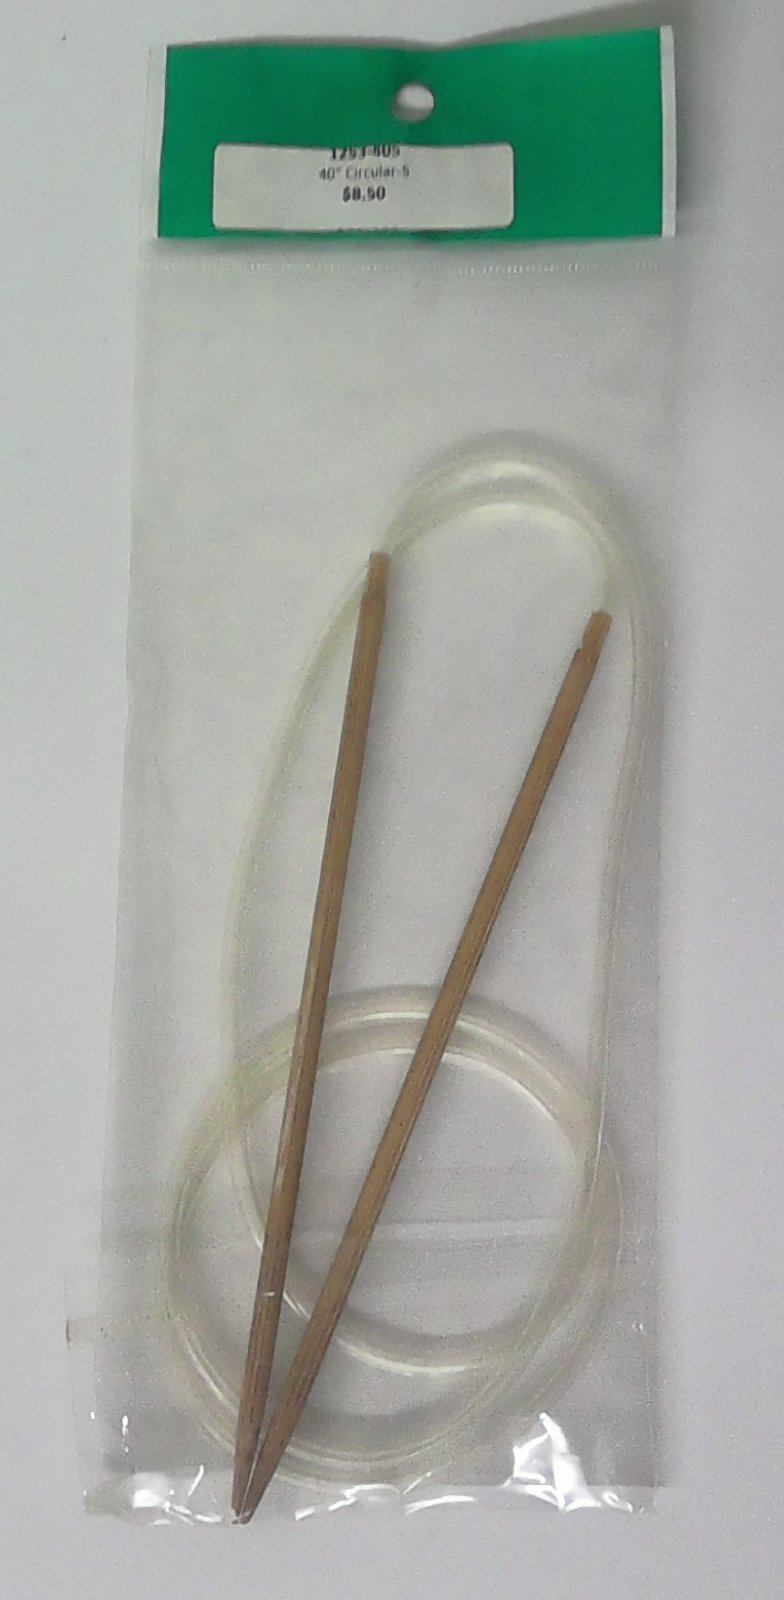 40 Circular Needles - Size 5